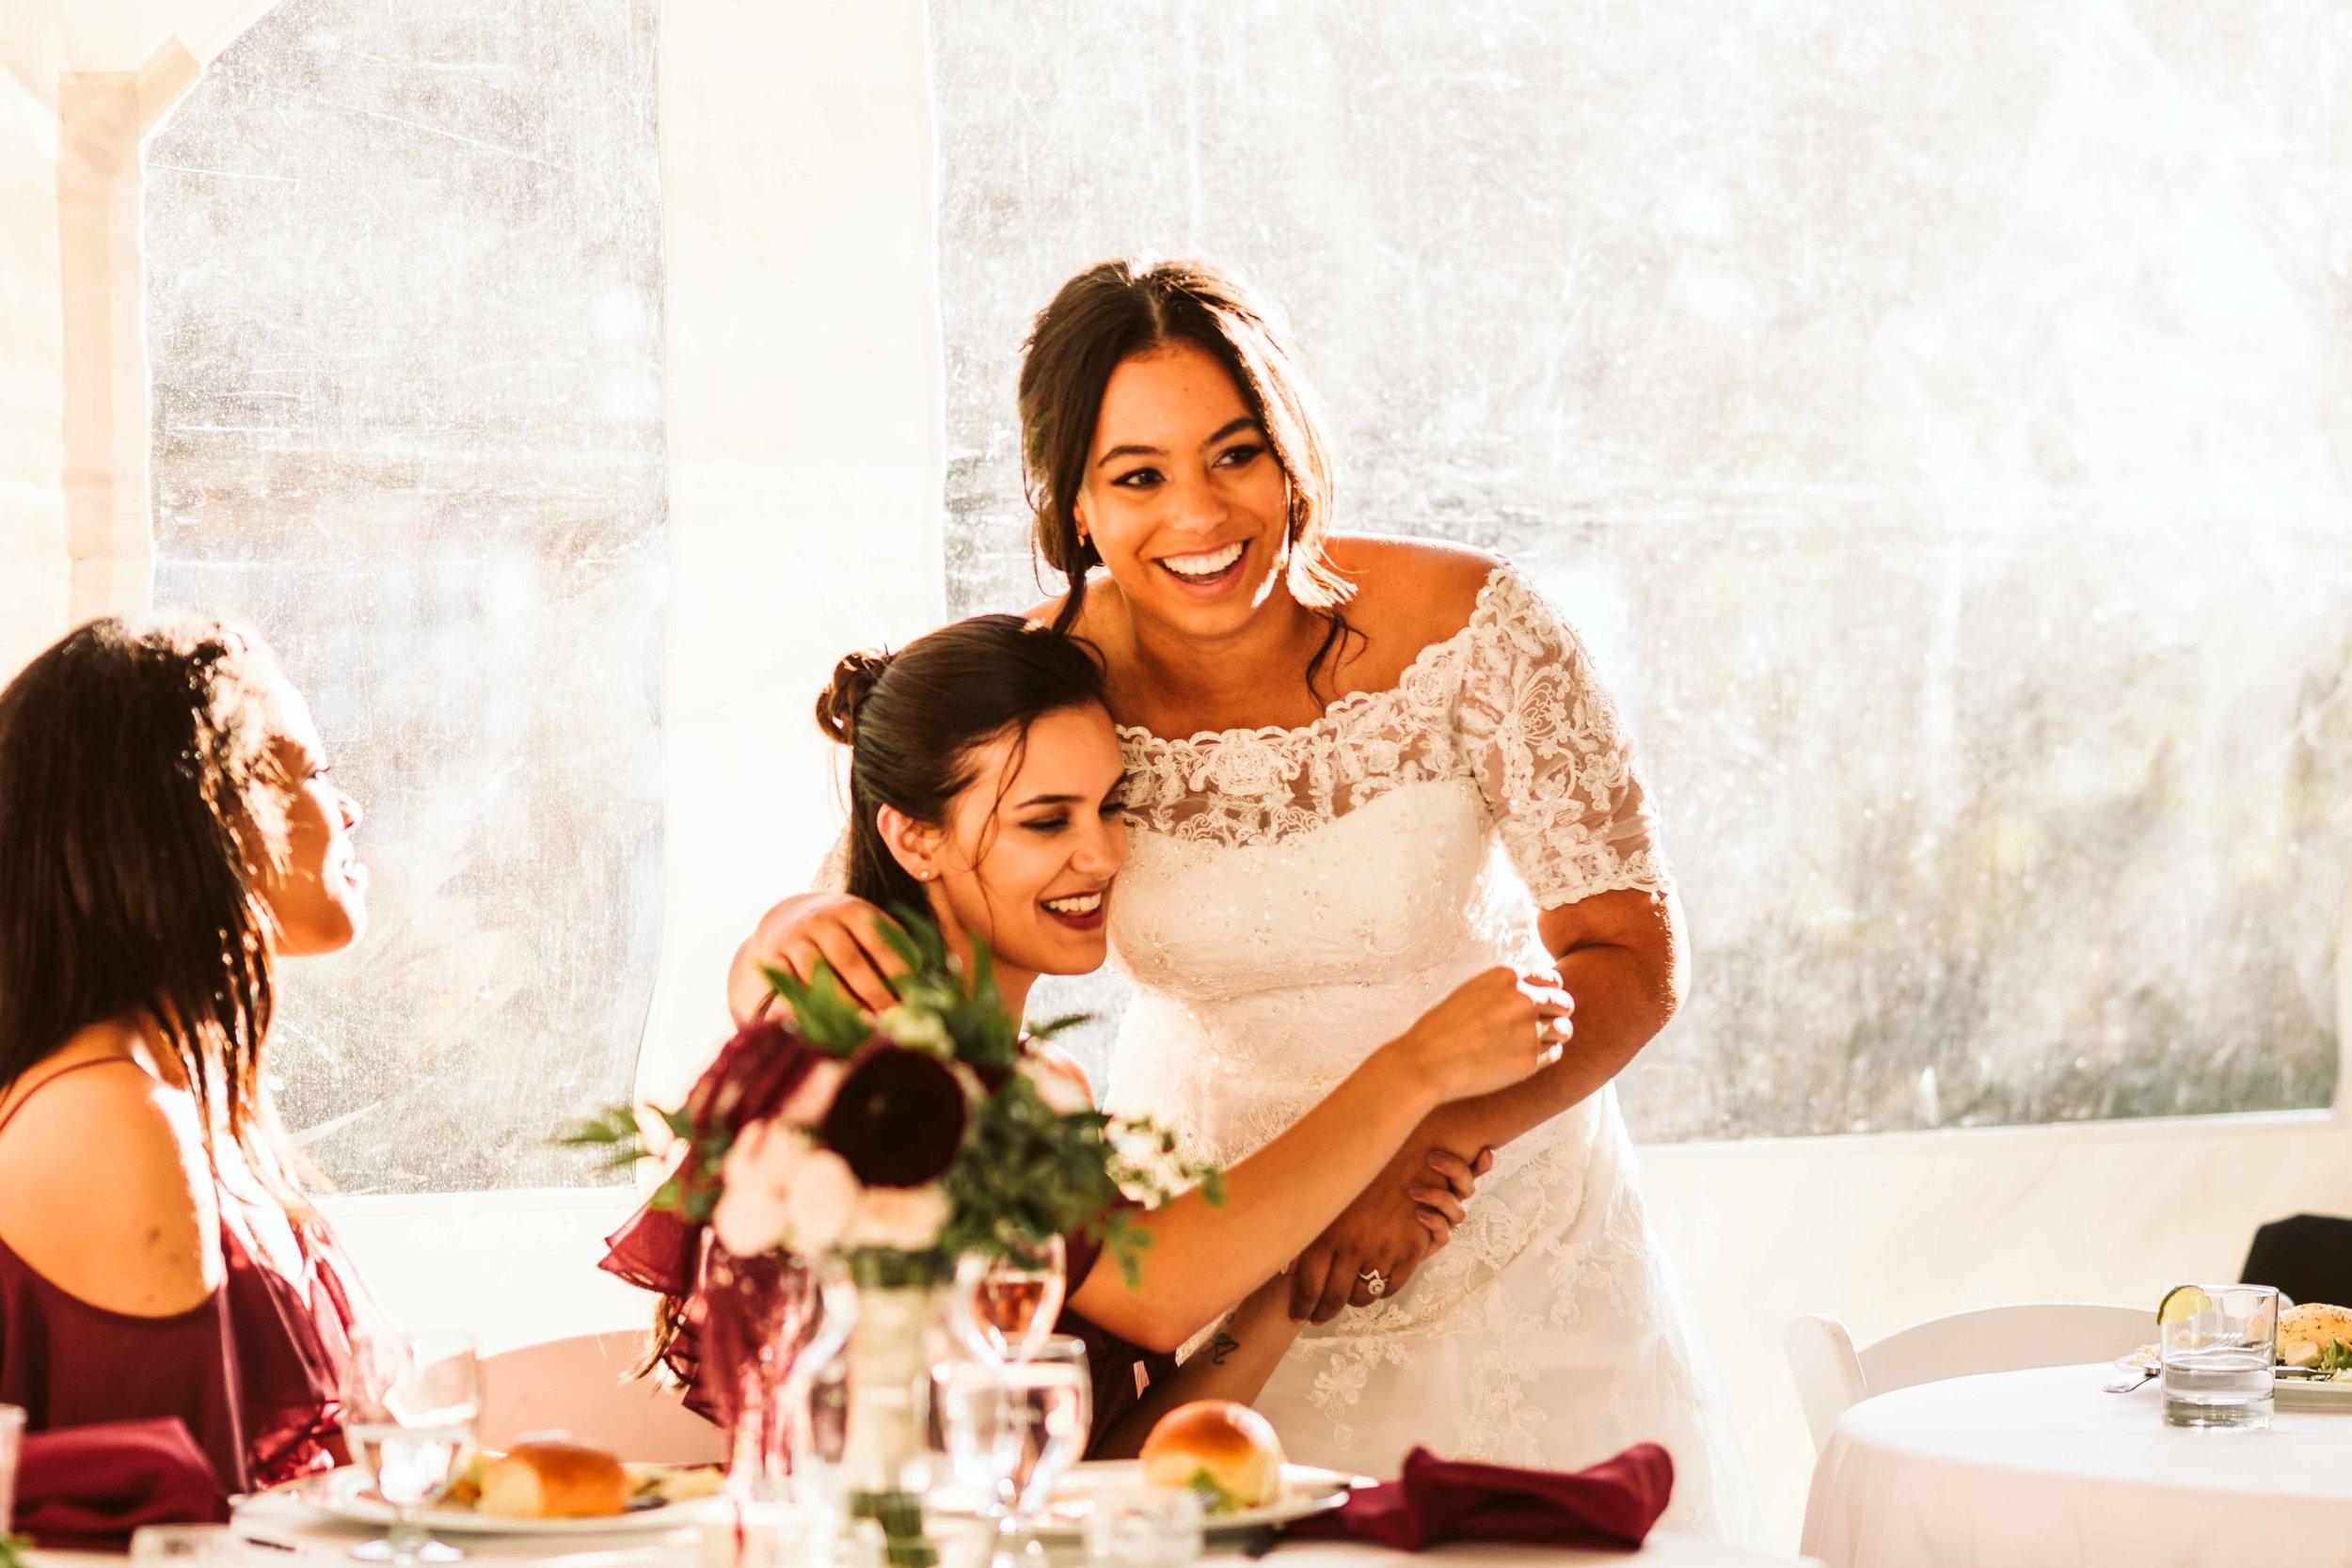 lairmont-manor-wedding-90.jpg